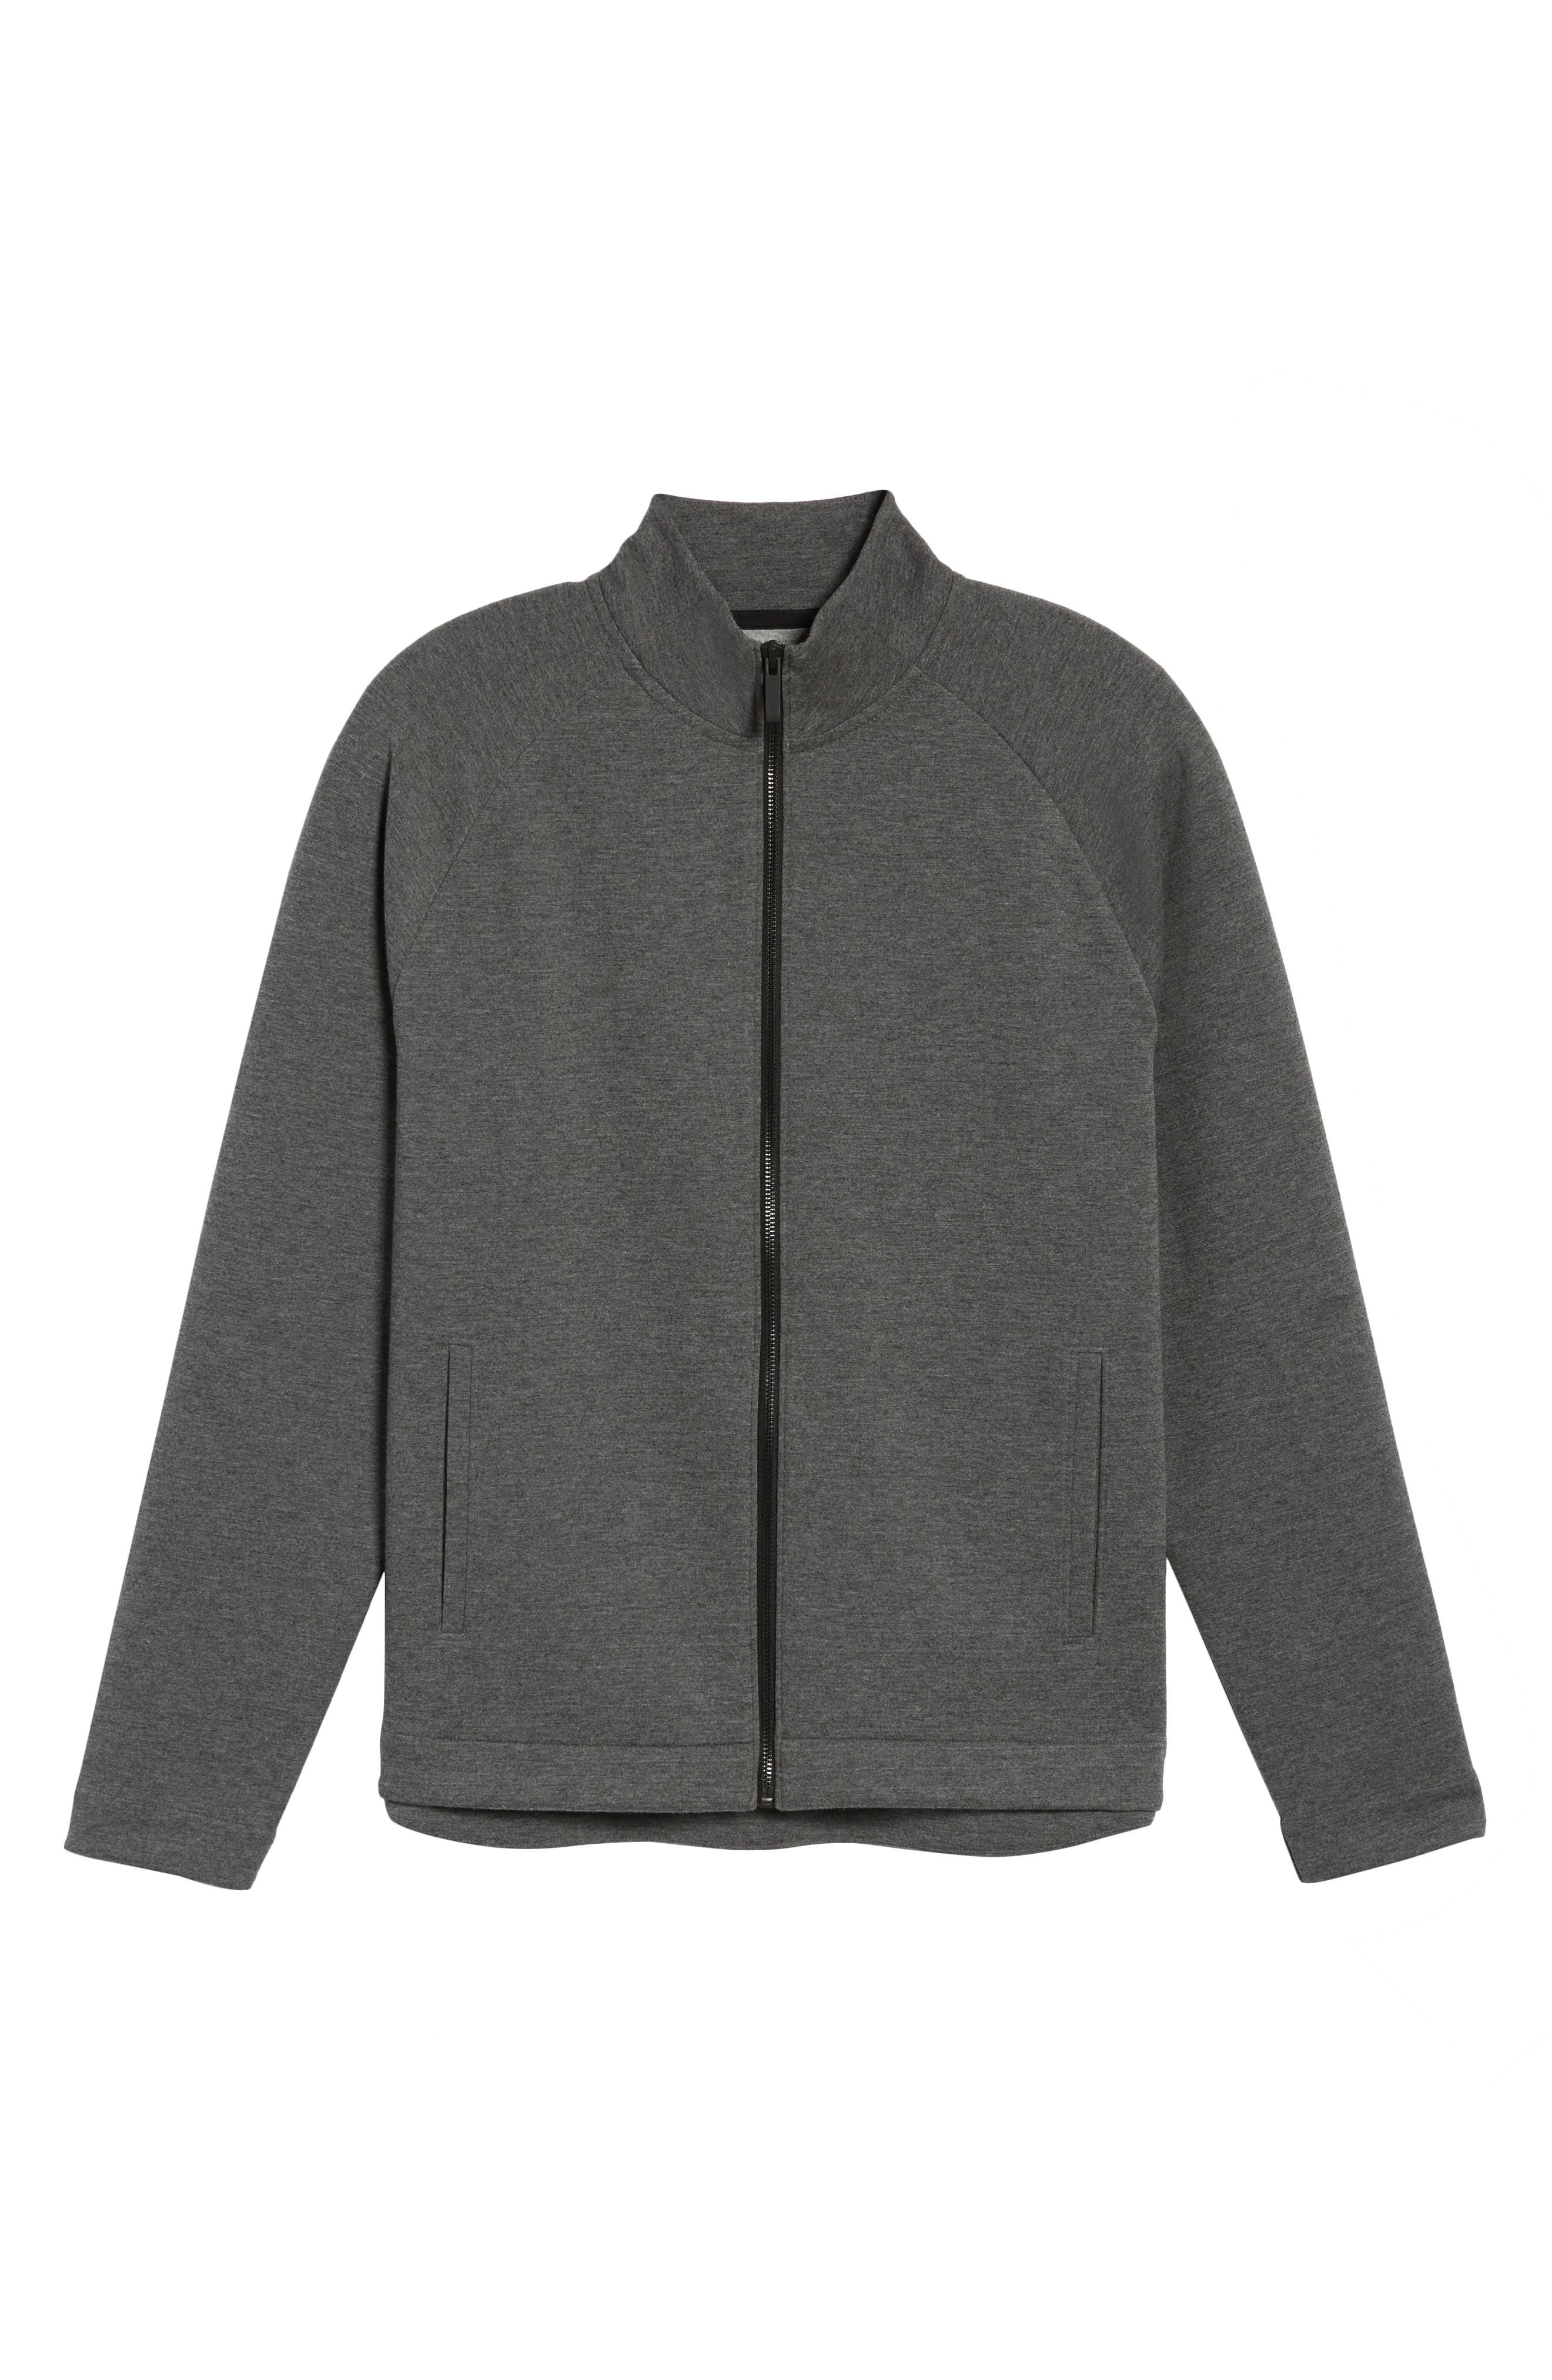 Fleece Jacket,                             Alternate thumbnail 5, color,                             030